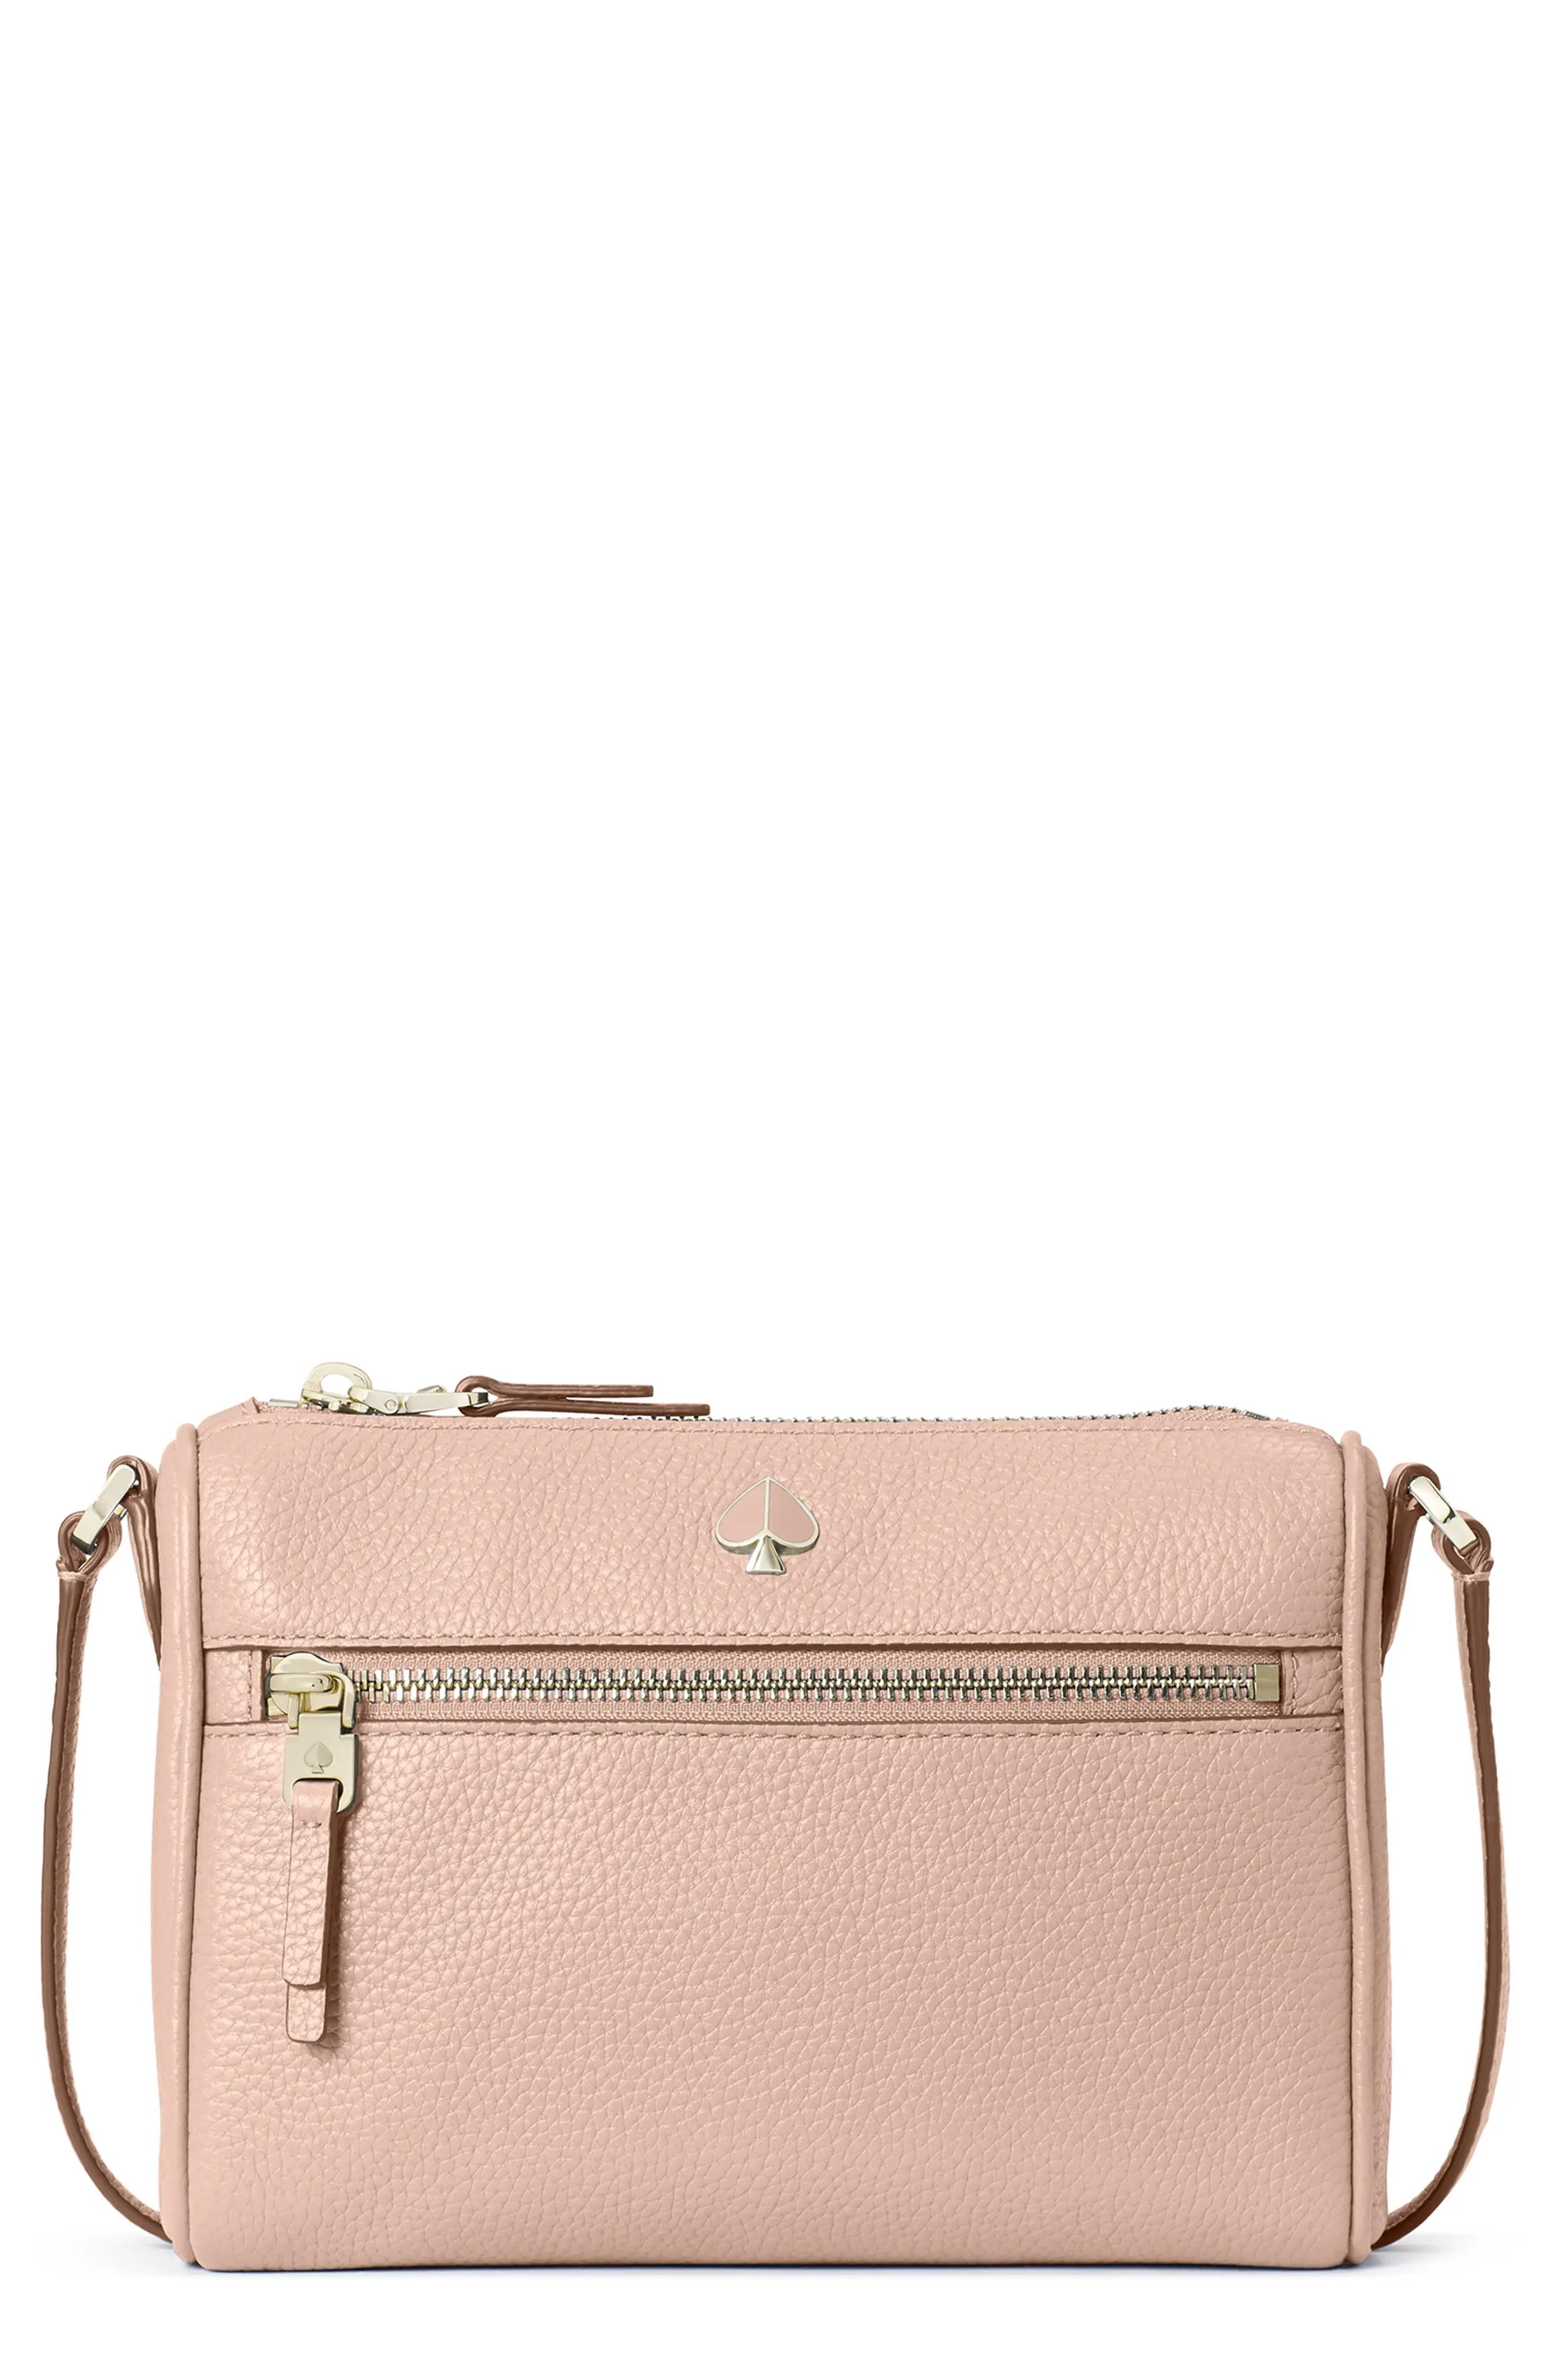 kate spade new york women s handbags